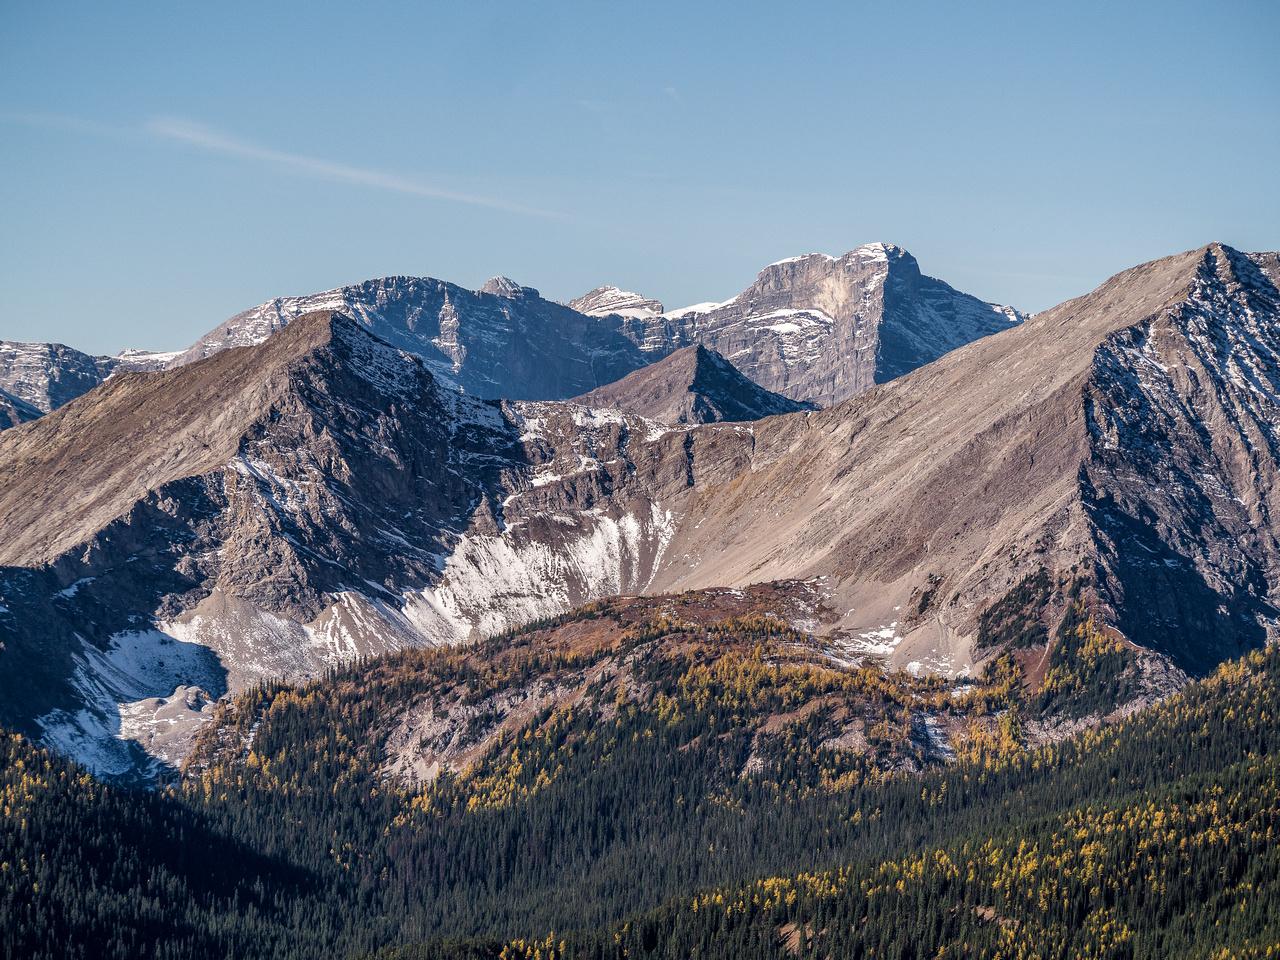 Mount Abruzzi pokes over the Odlum Col.